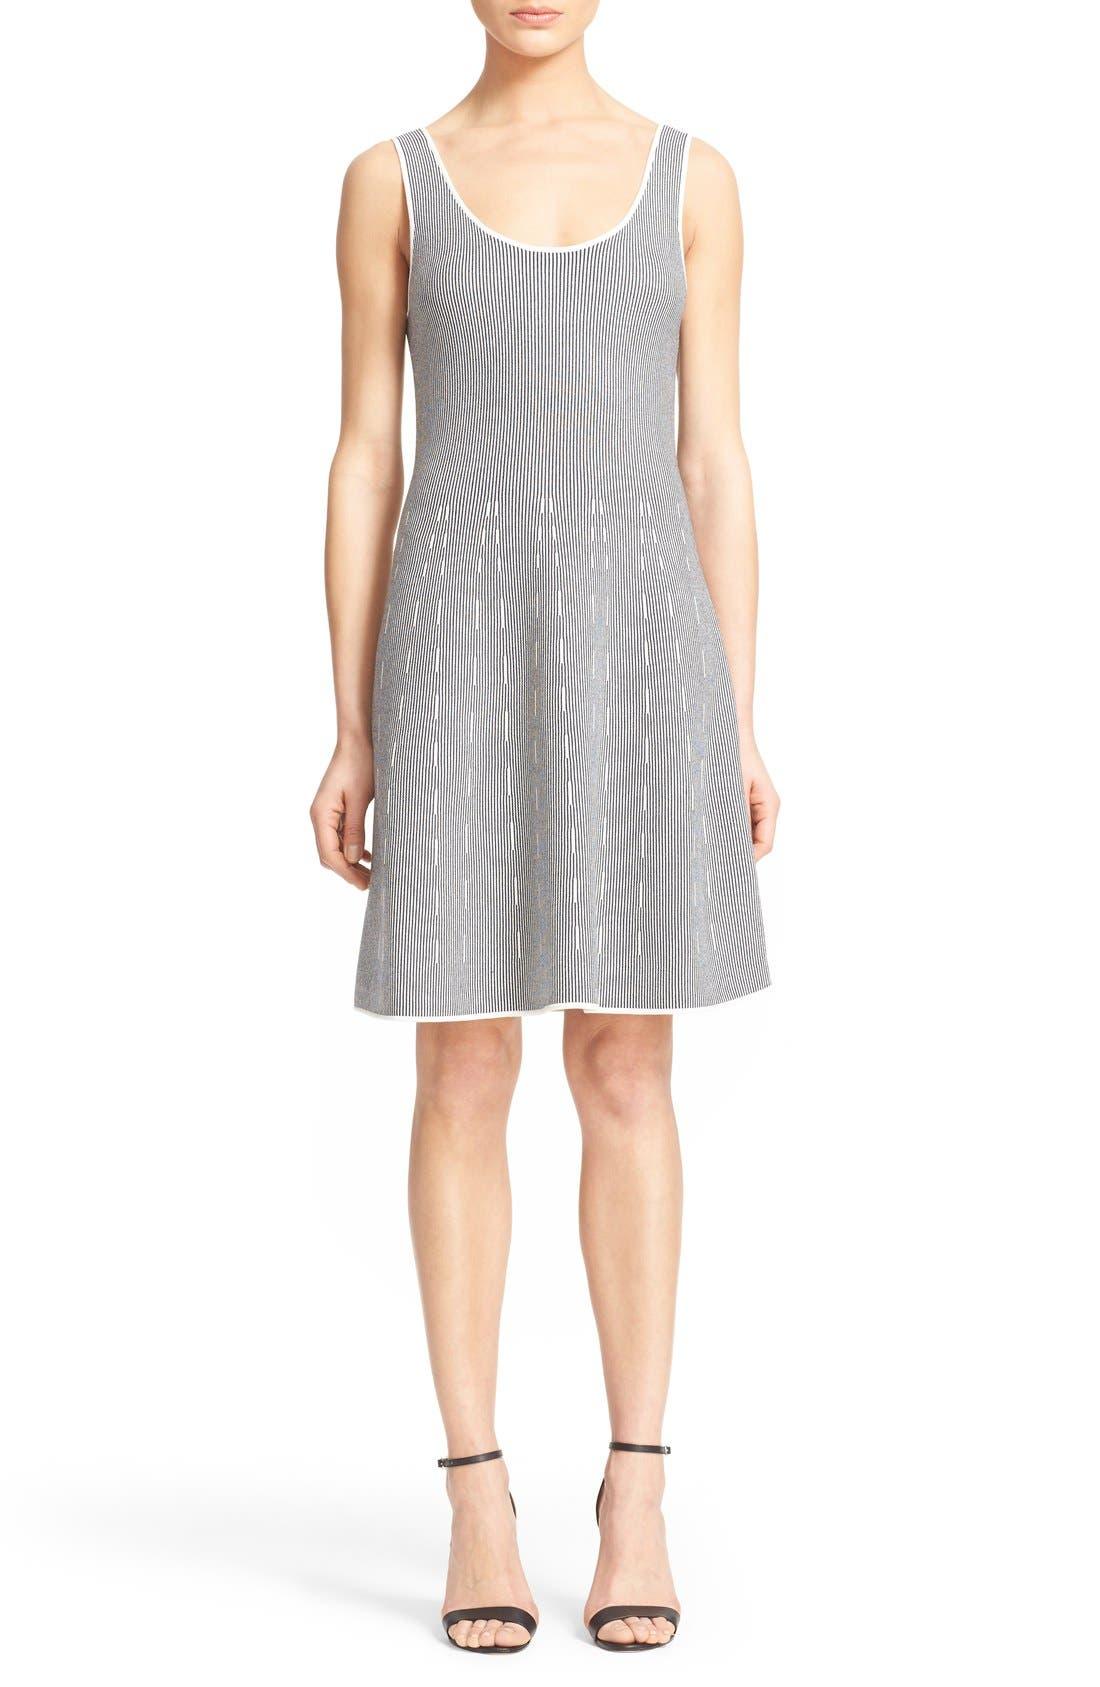 Main Image - Theory 'Codris' Knit Fit & Flare Dress